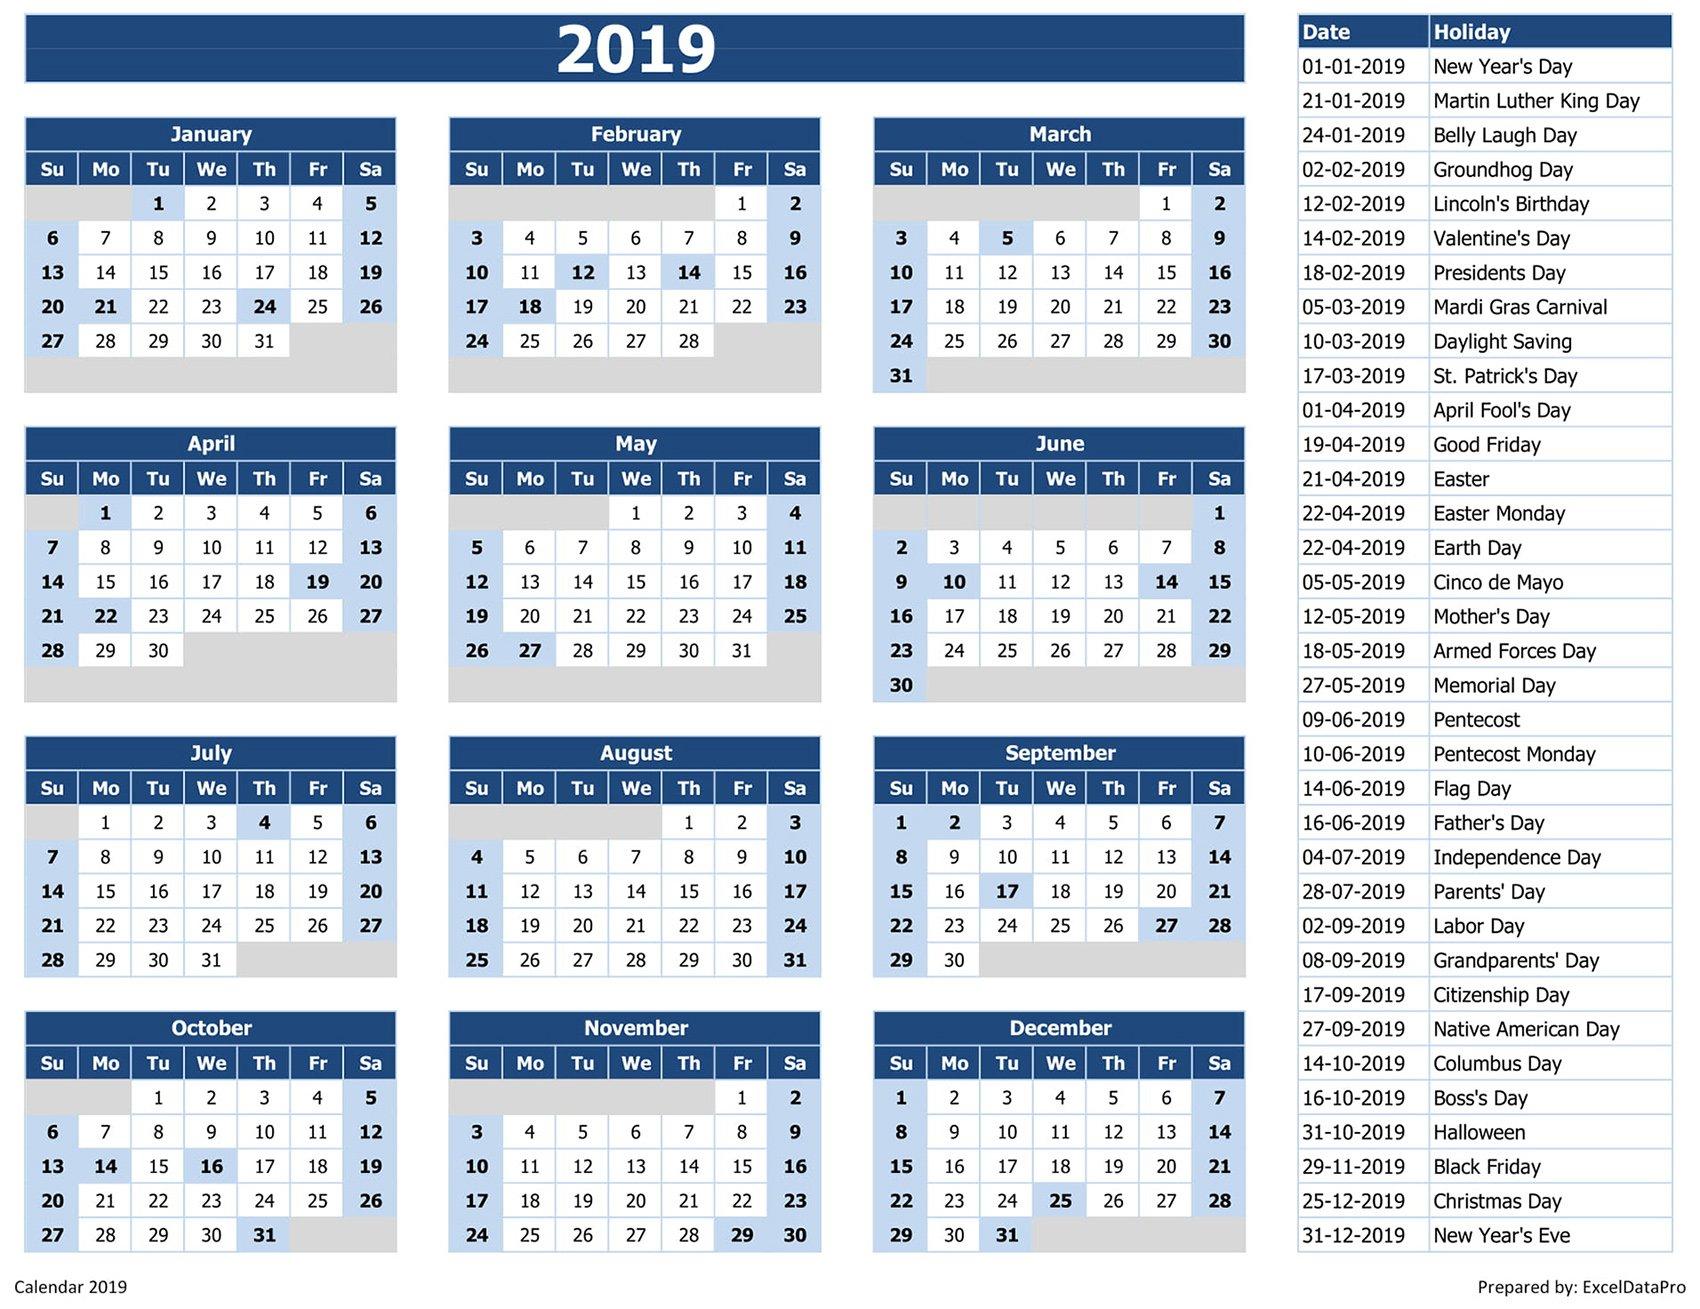 Download 2019 Yearly Calendar (Sun Start) Excel Template – Exceldatapro Calendar 2019 List